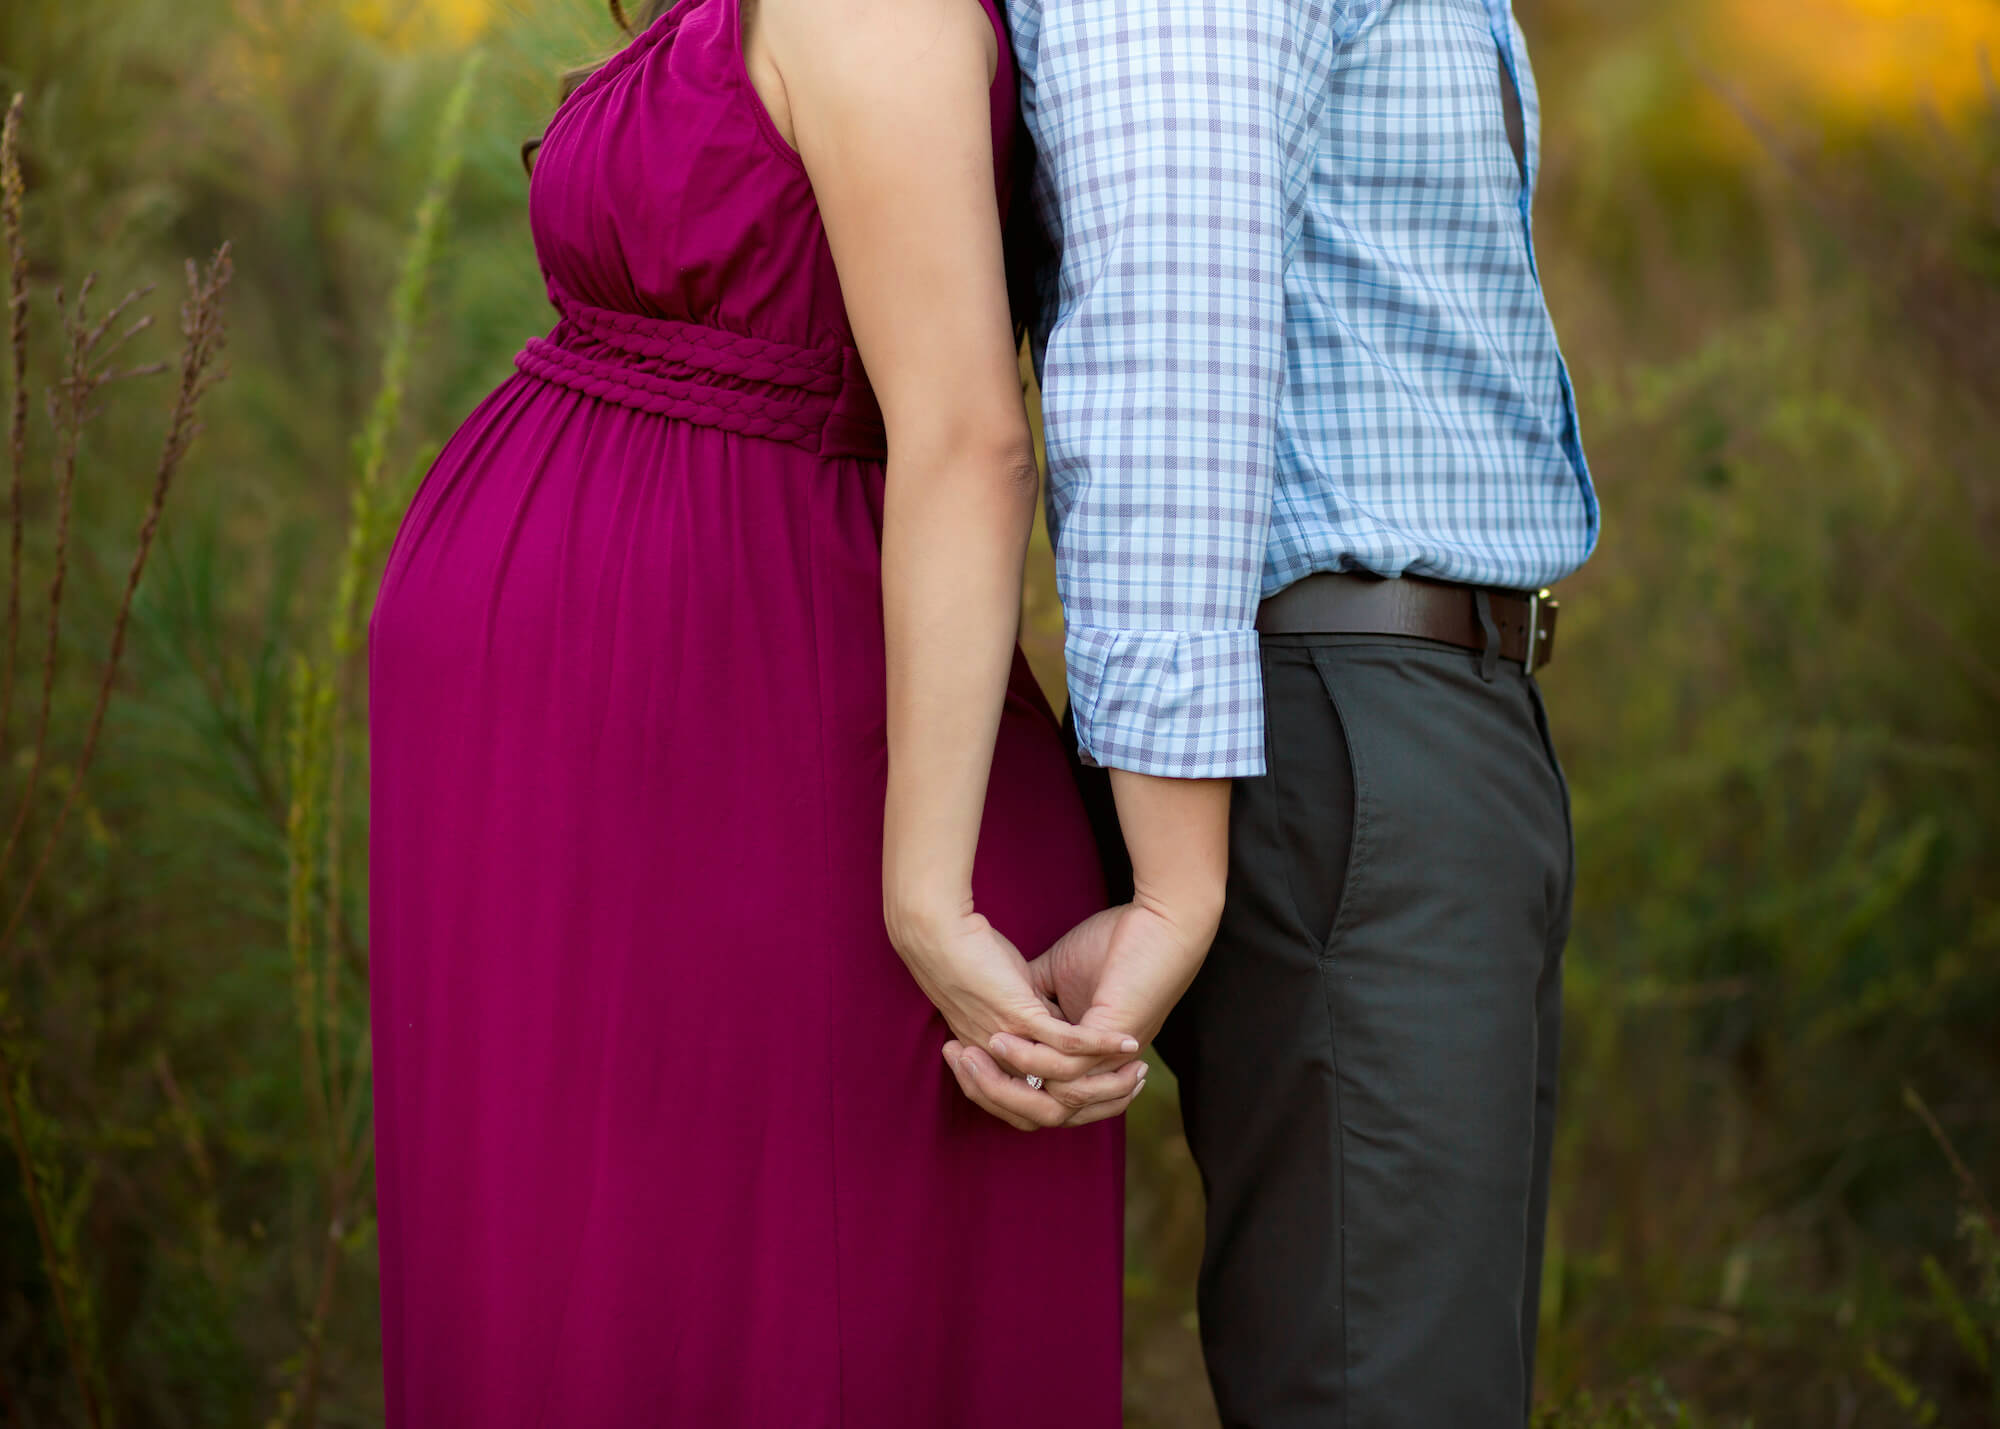 raleigh maternity photographer